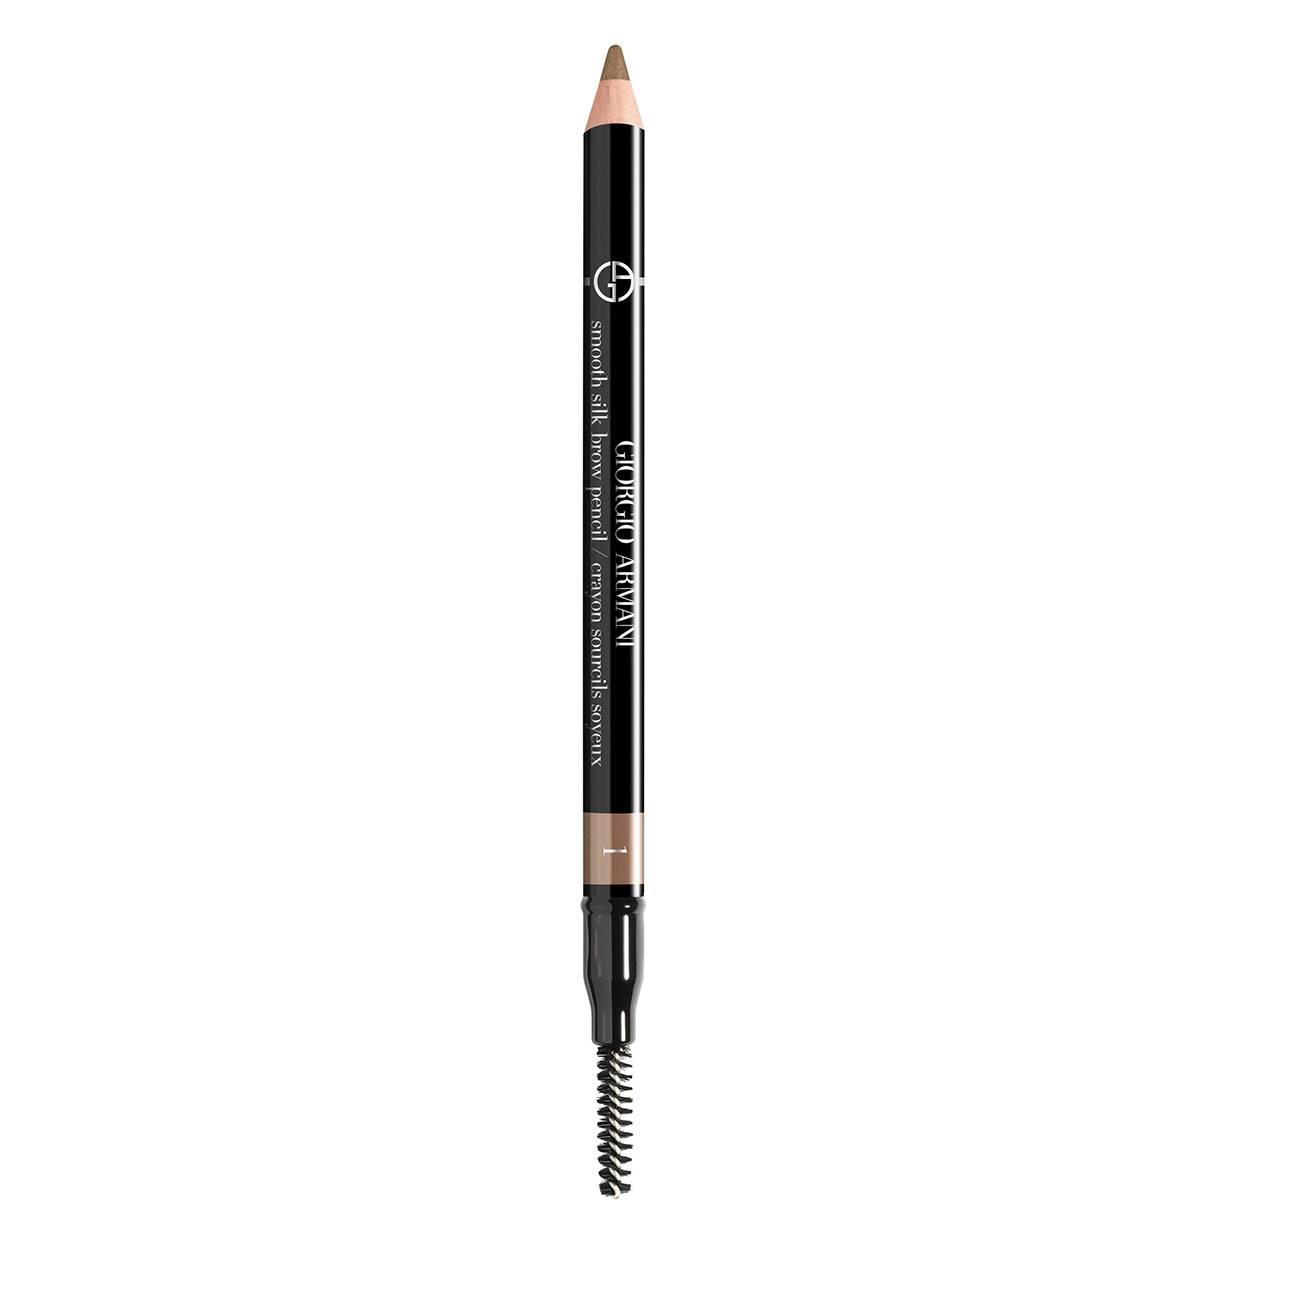 Smooth Silk Eyebrow Pencil 1 1.19gr Giorgio Armani imagine 2021 bestvalue.eu